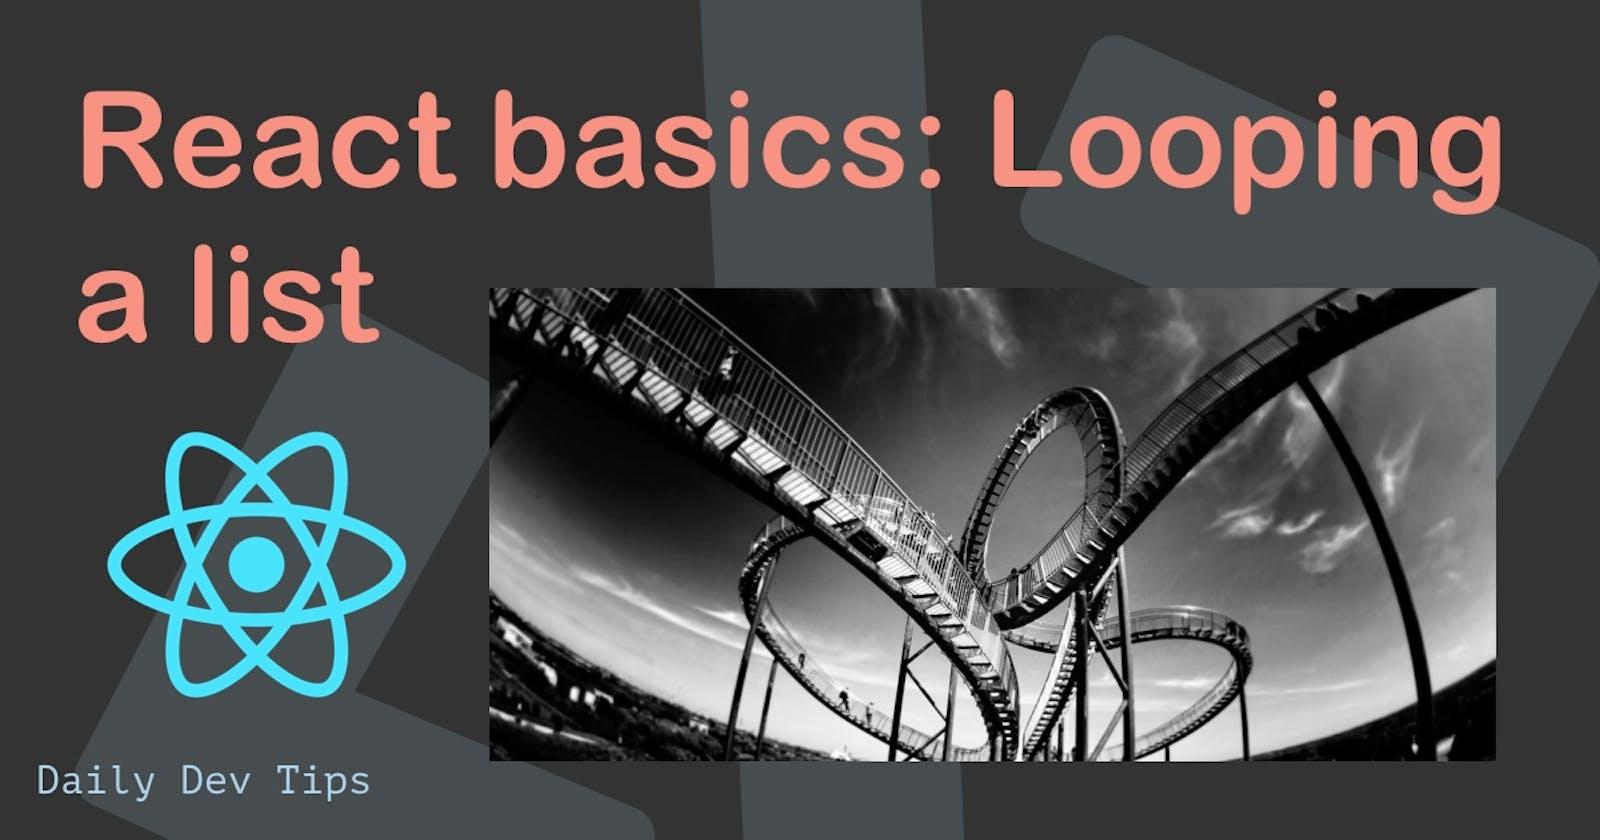 React basics: Looping a list